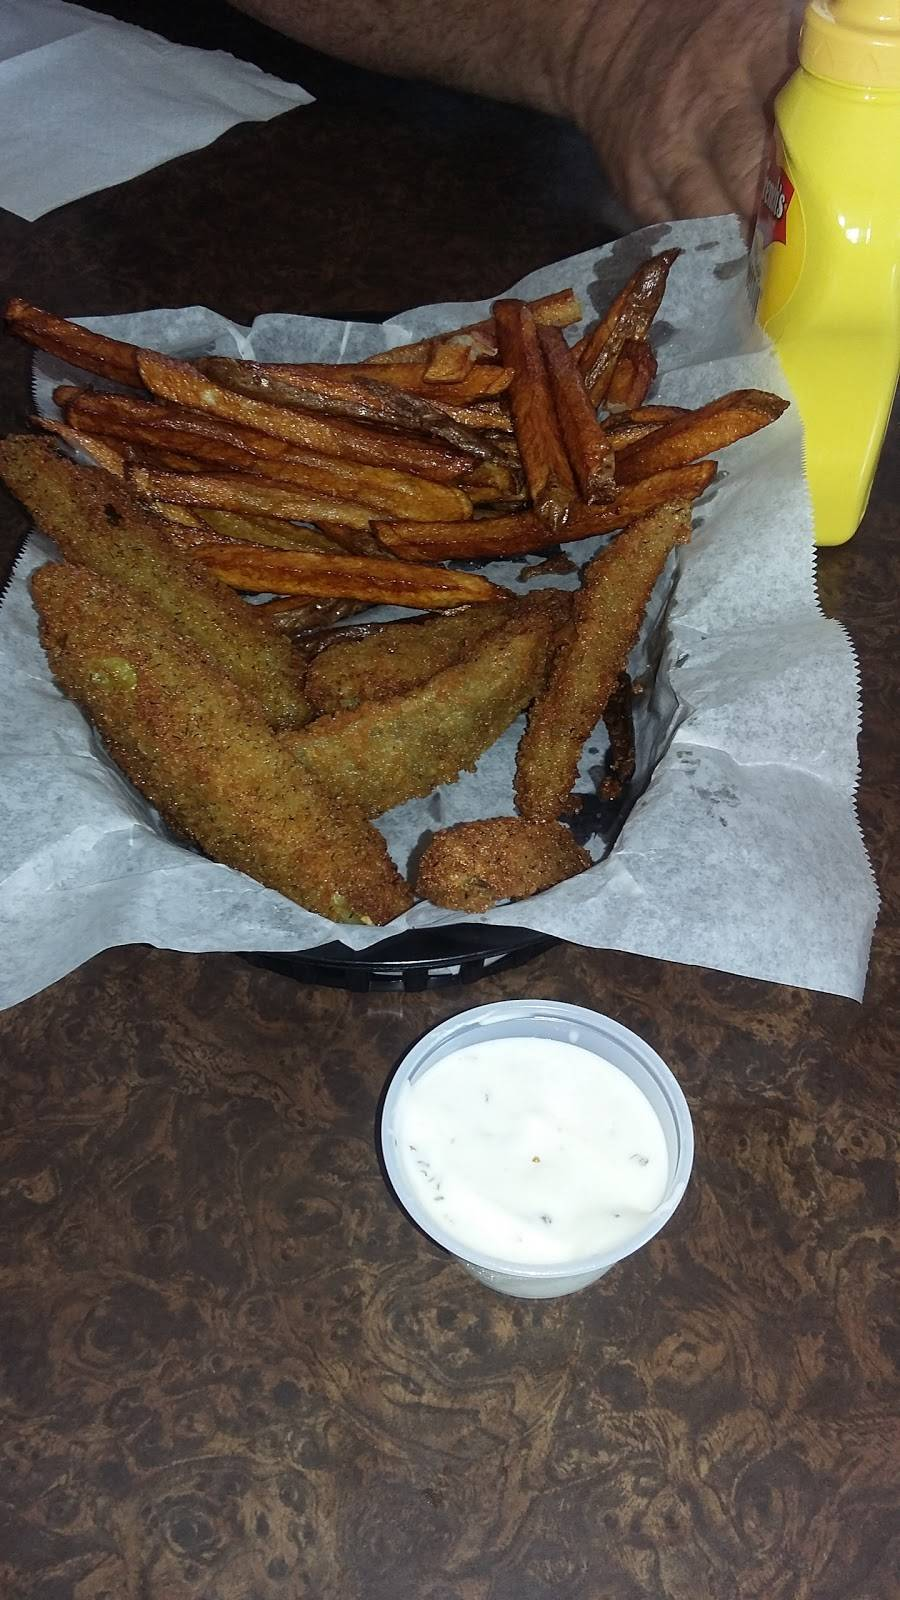 Gimpys on 150   restaurant   285 Knox Hwy 2, Rio, IL 61472, USA   3099725616 OR +1 309-972-5616